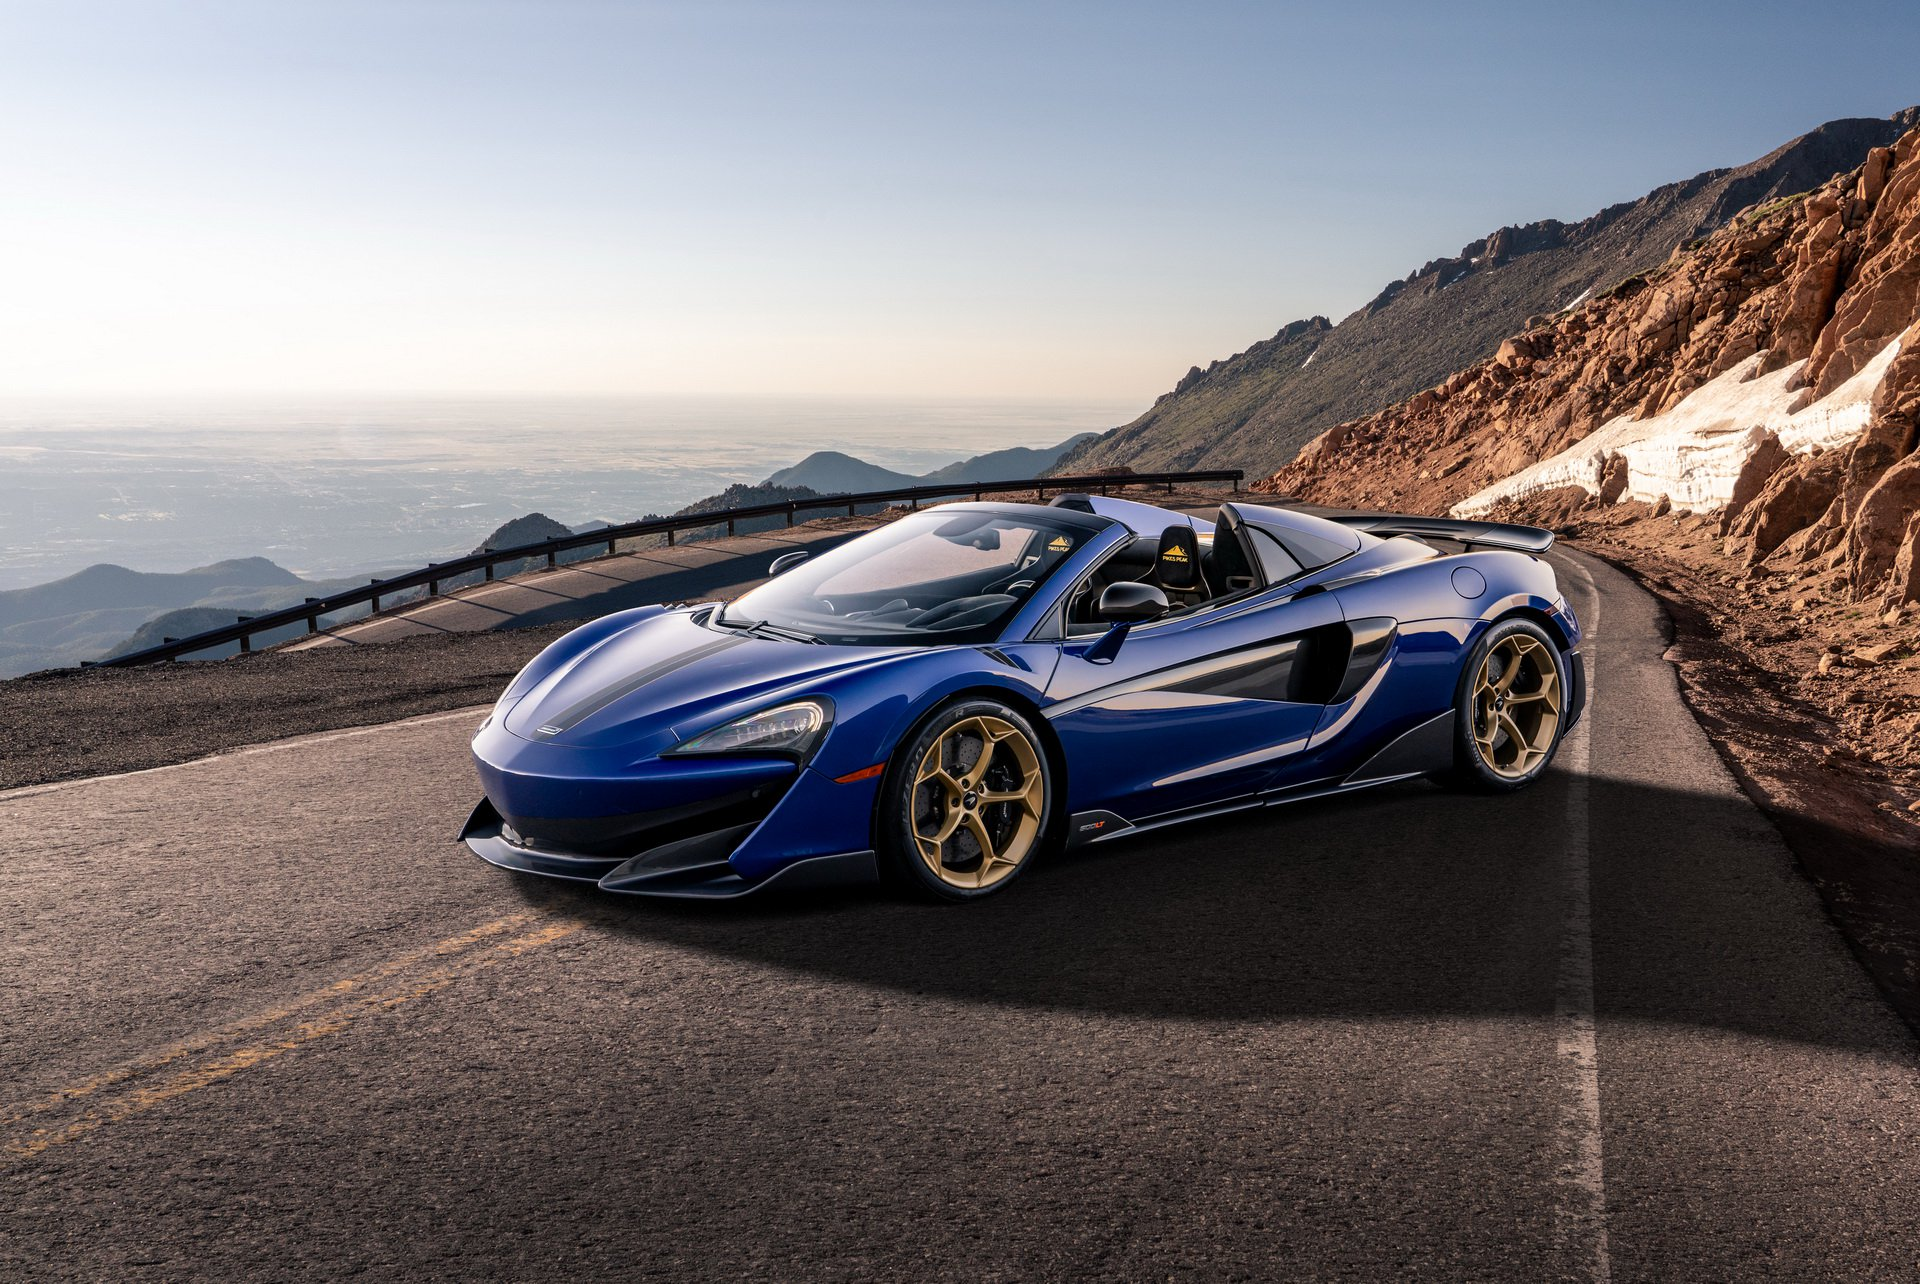 McLaren-600LT-Spider-Pikes-Peak-Collection-by-MSO-6